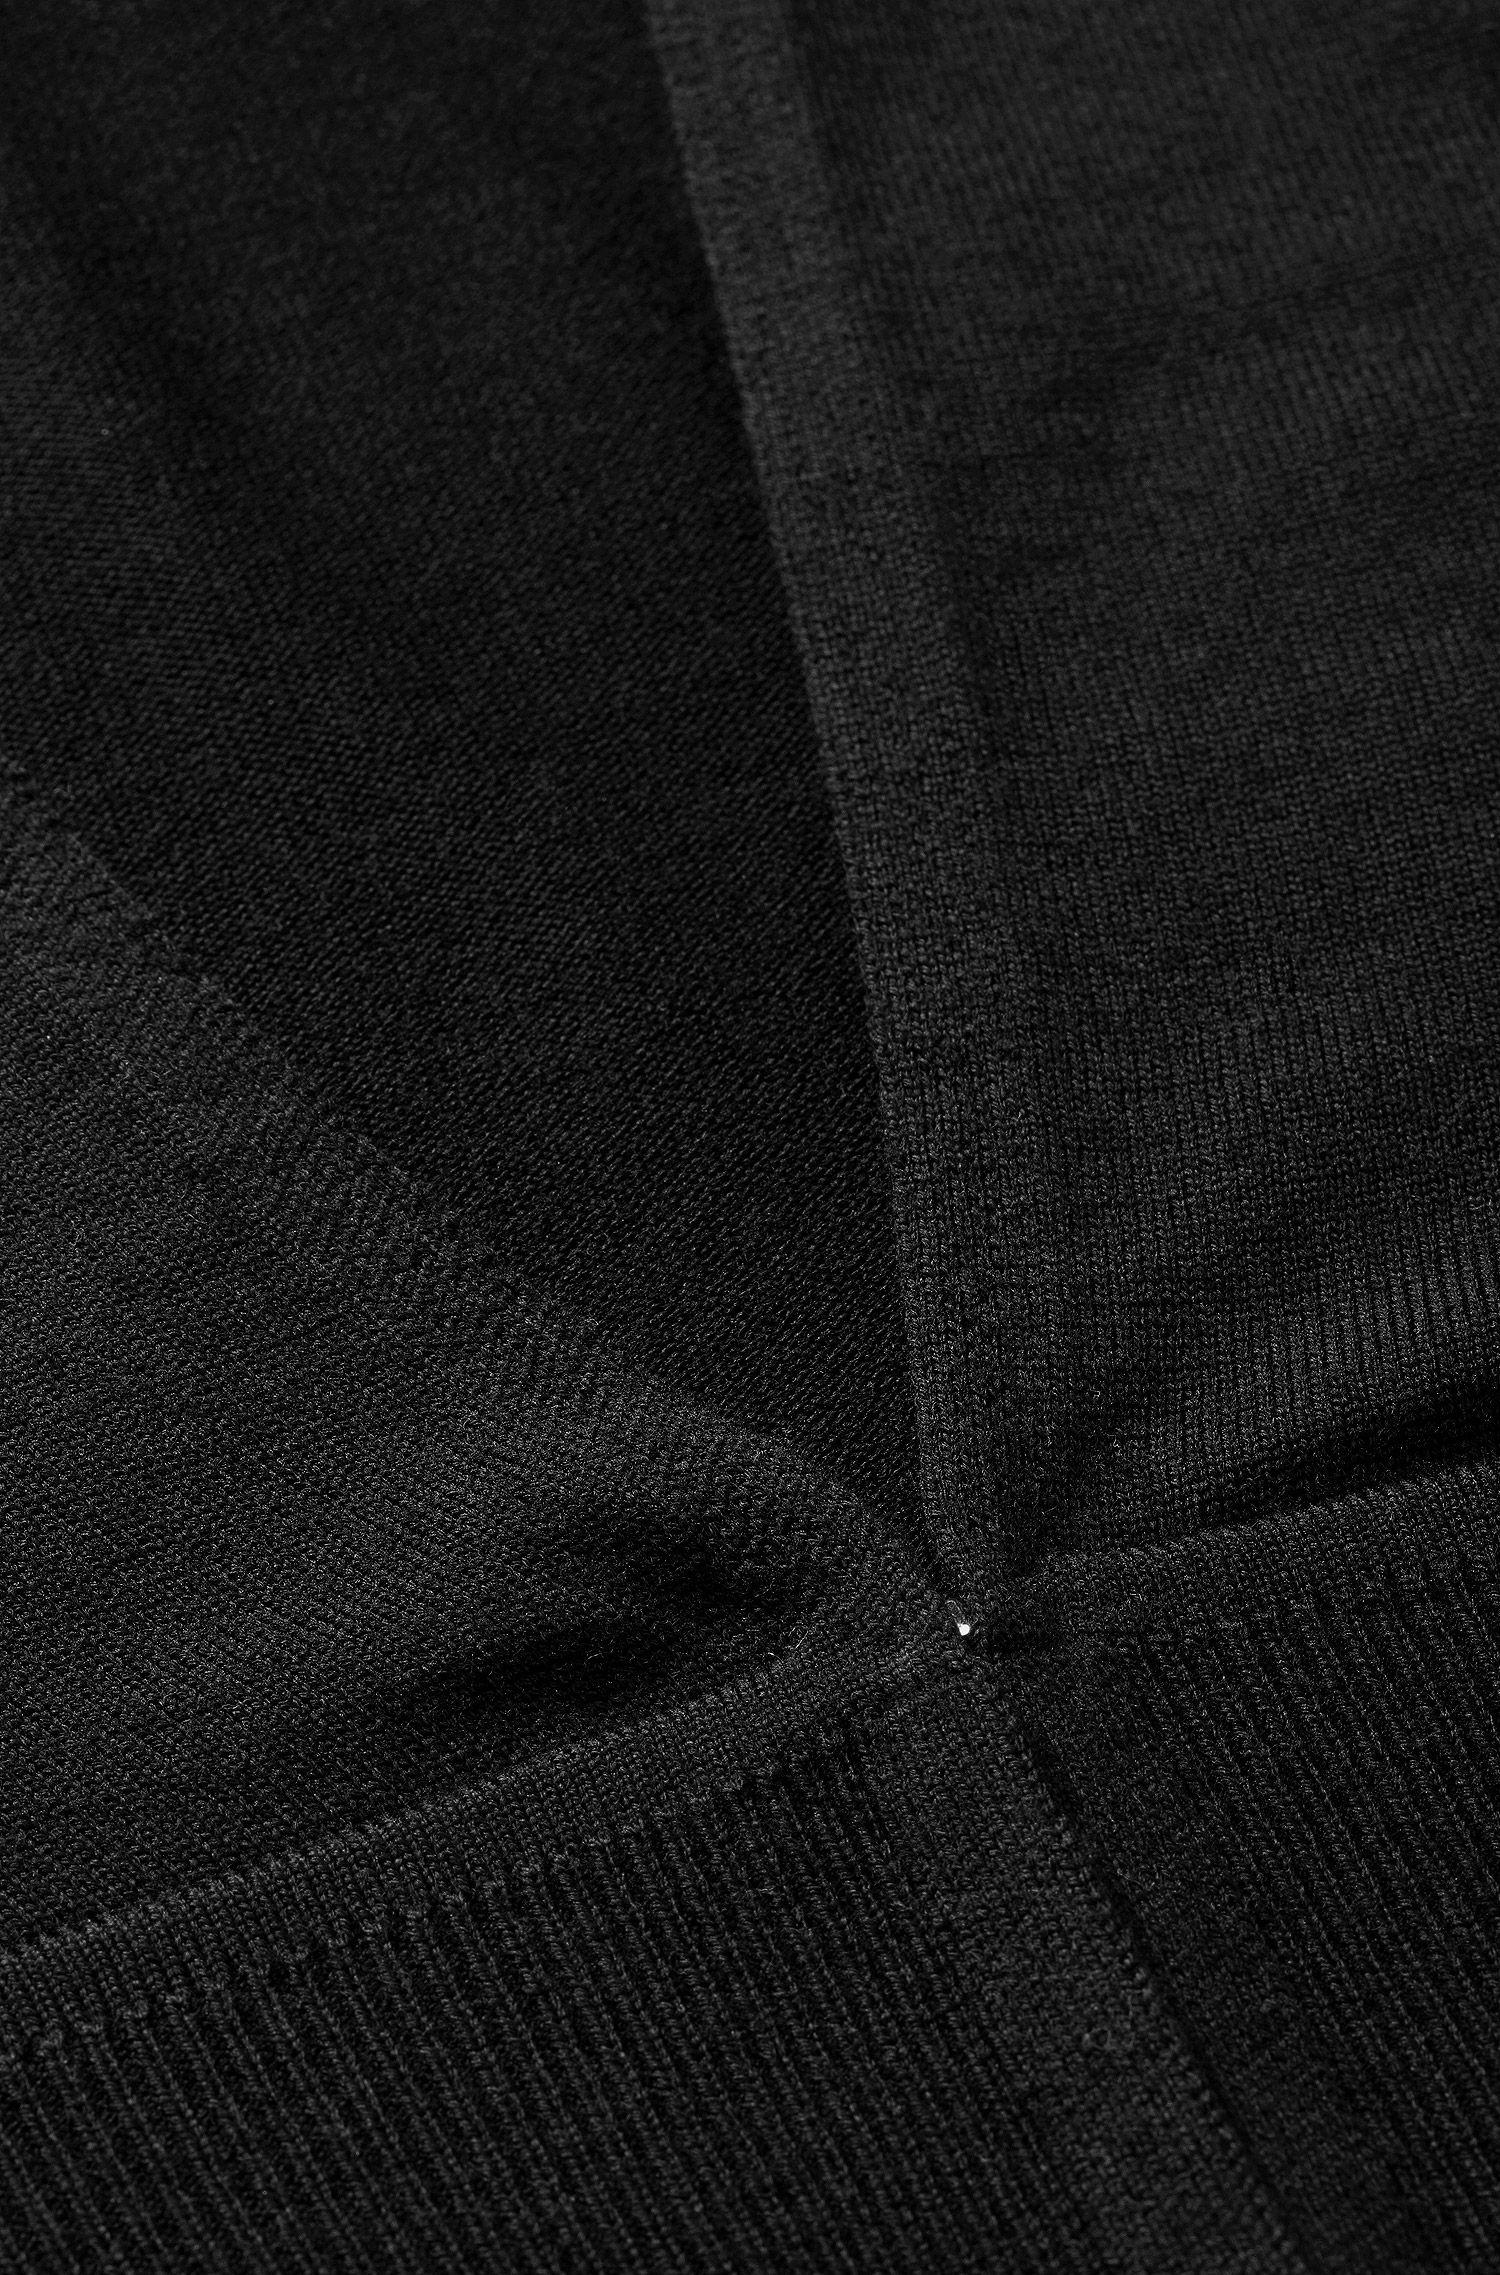 Cardigan ´Feisa` aus Schurwolle